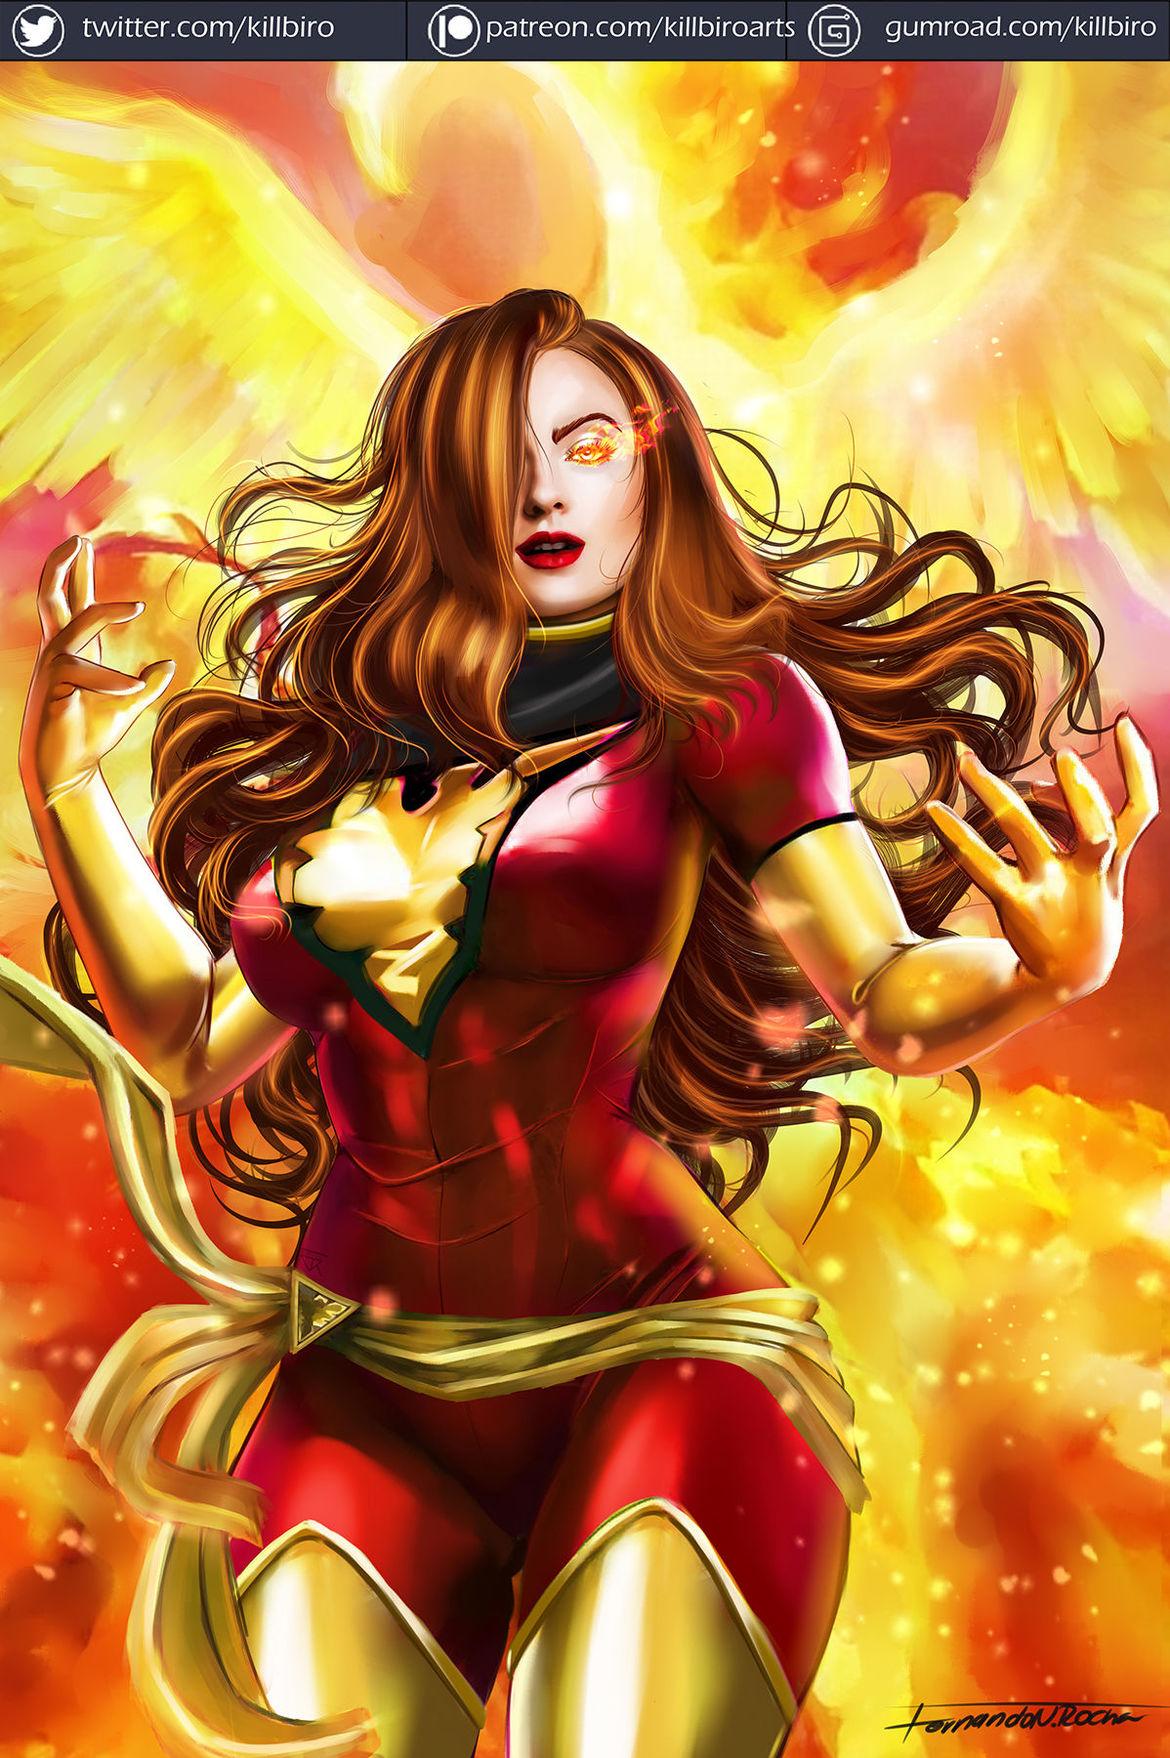 X-Men Fanfiction: Dark Phoenix and Jean Grey stories